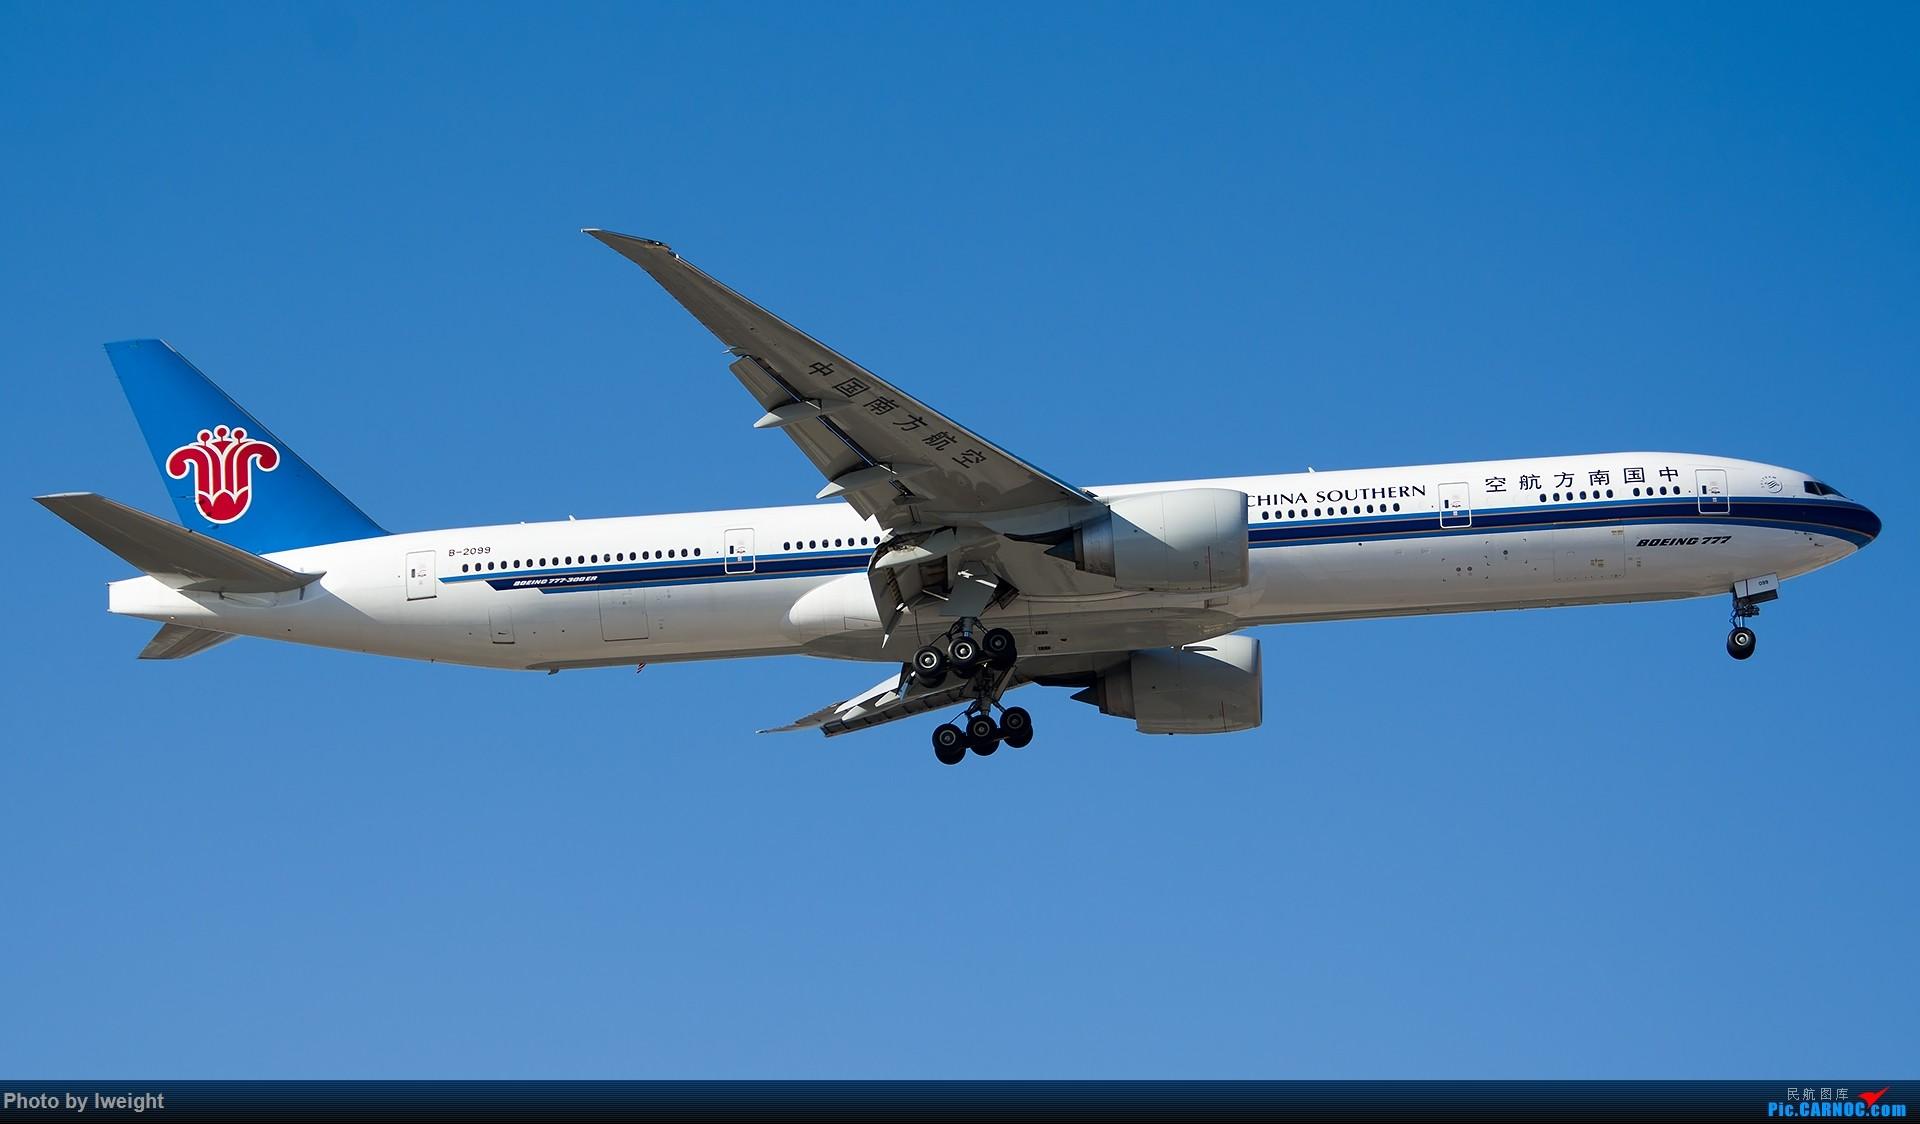 Re:[原创]北京难得的好天气,随手拍了一些渣图【2015-01-27】 BOEING 777-300ER B-2099 中国北京首都国际机场